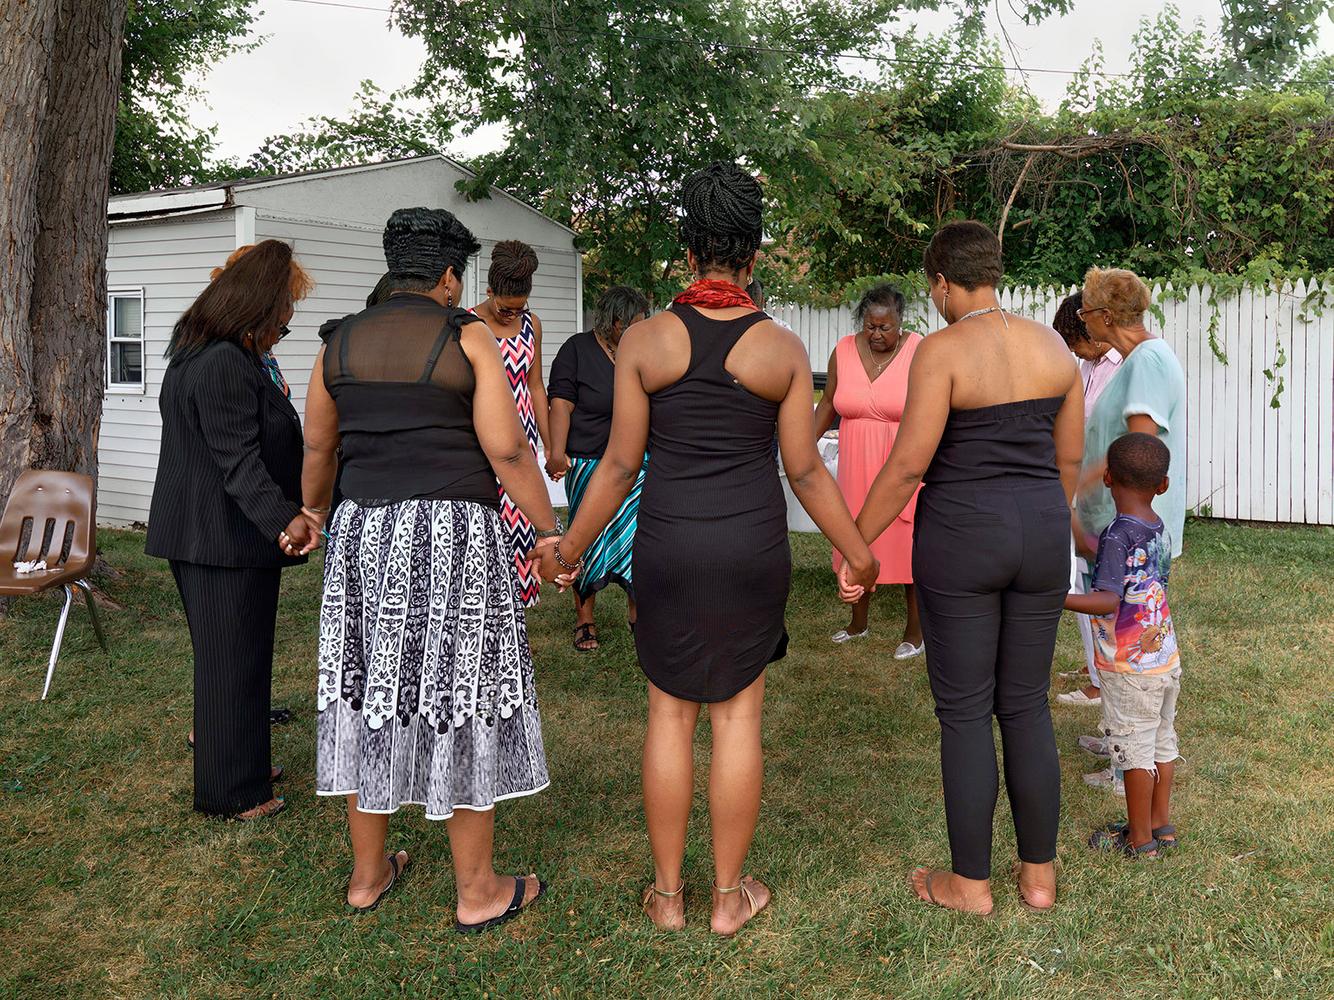 Backyard Prayer Circle After a Funeral, Eastside, Detroit 2015